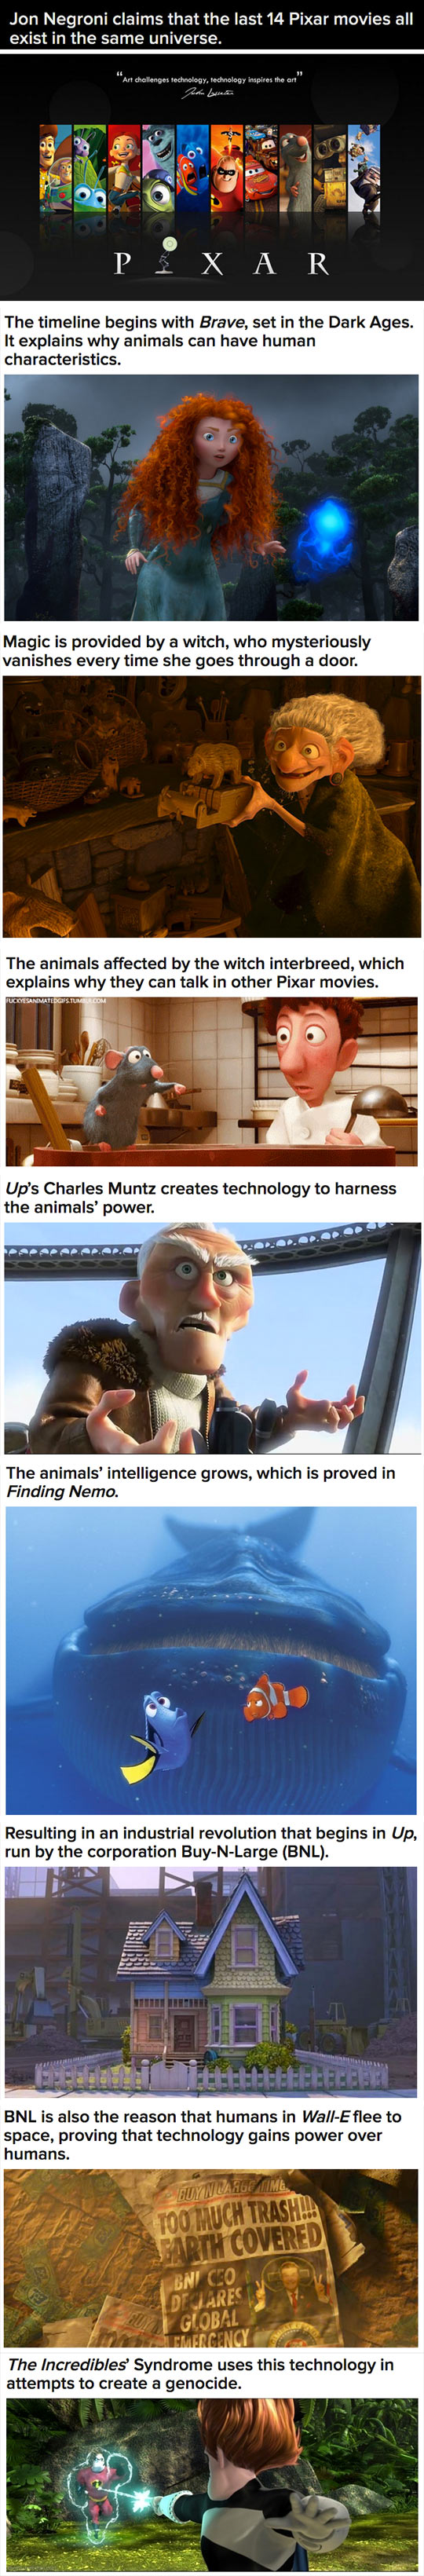 cool-Pixar-movies-same-universe-Brave-animals